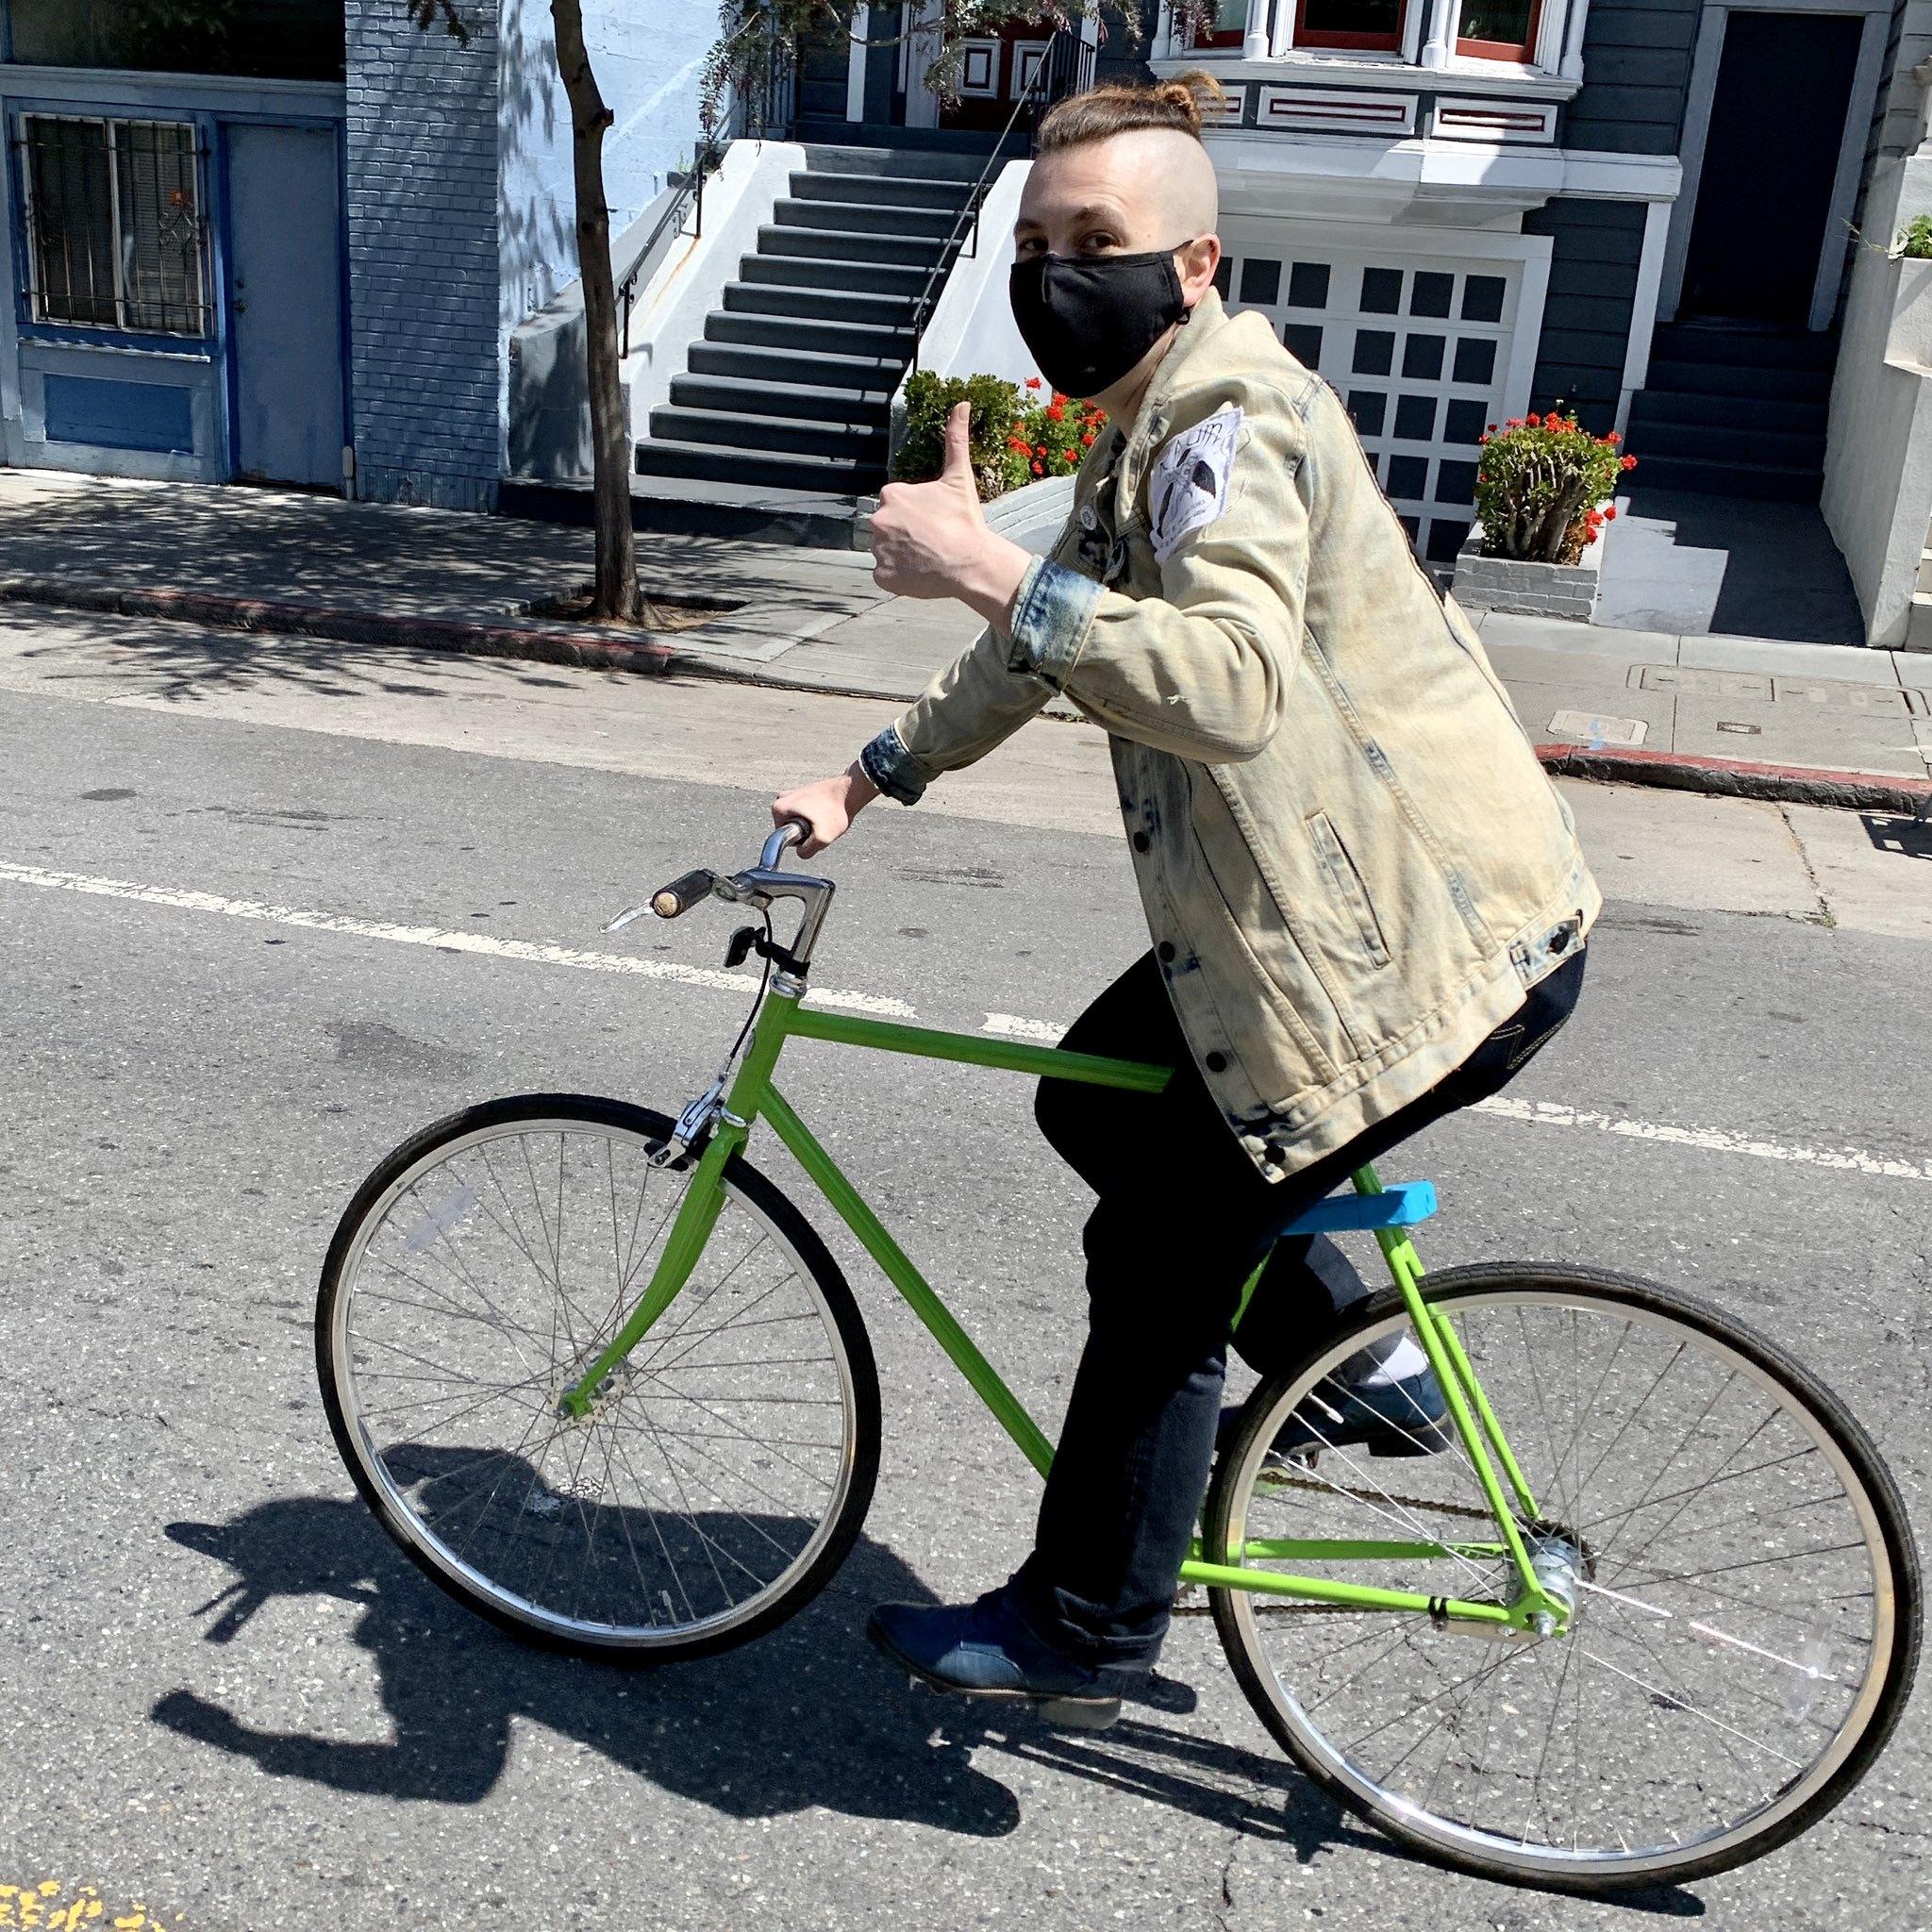 The Tequila Patrón Bike